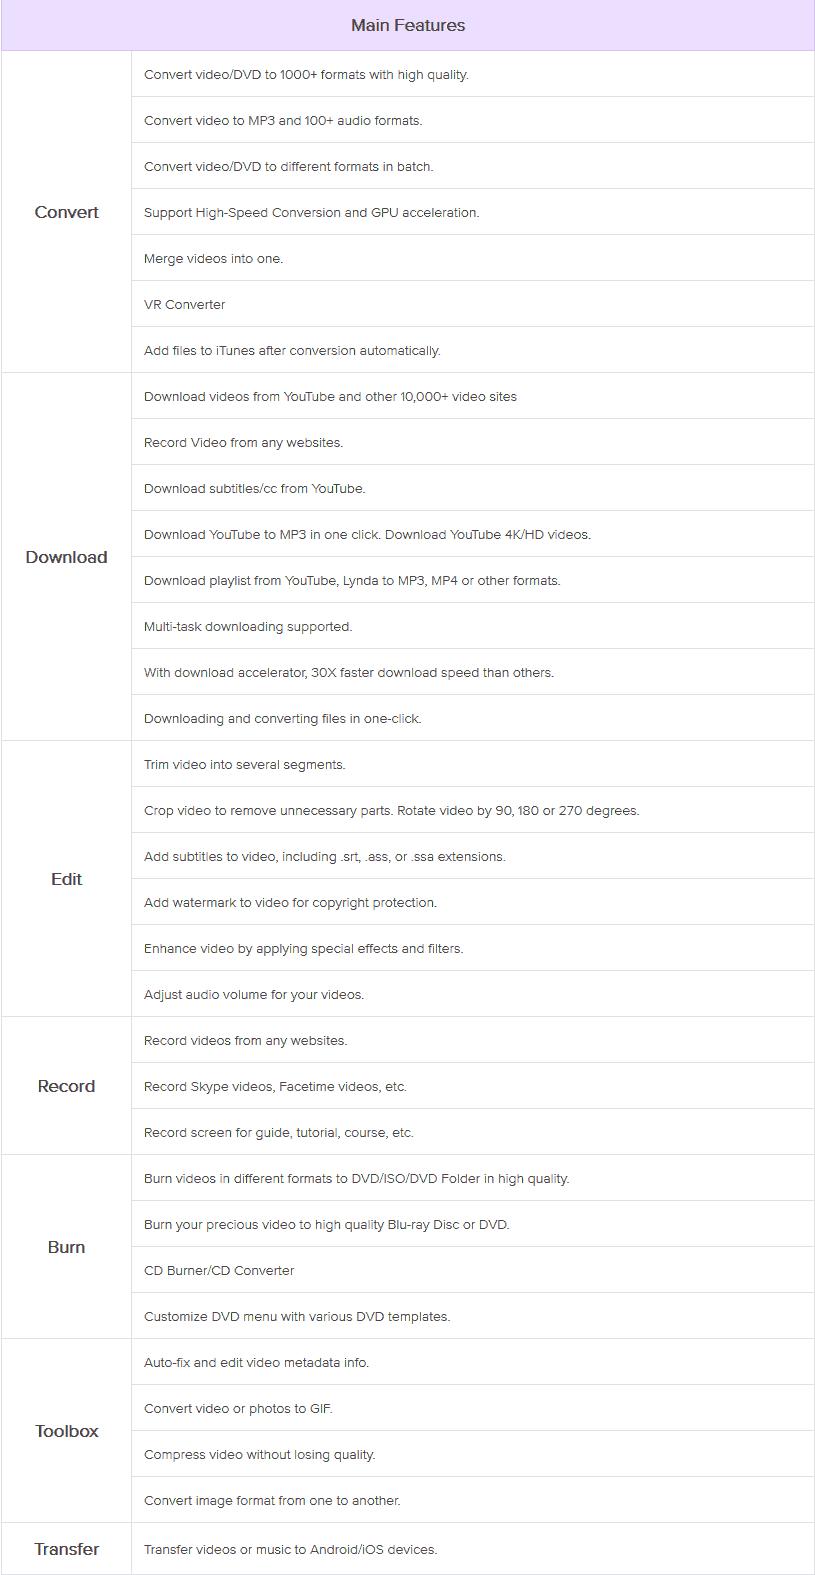 Features of Wondershare Video Converter